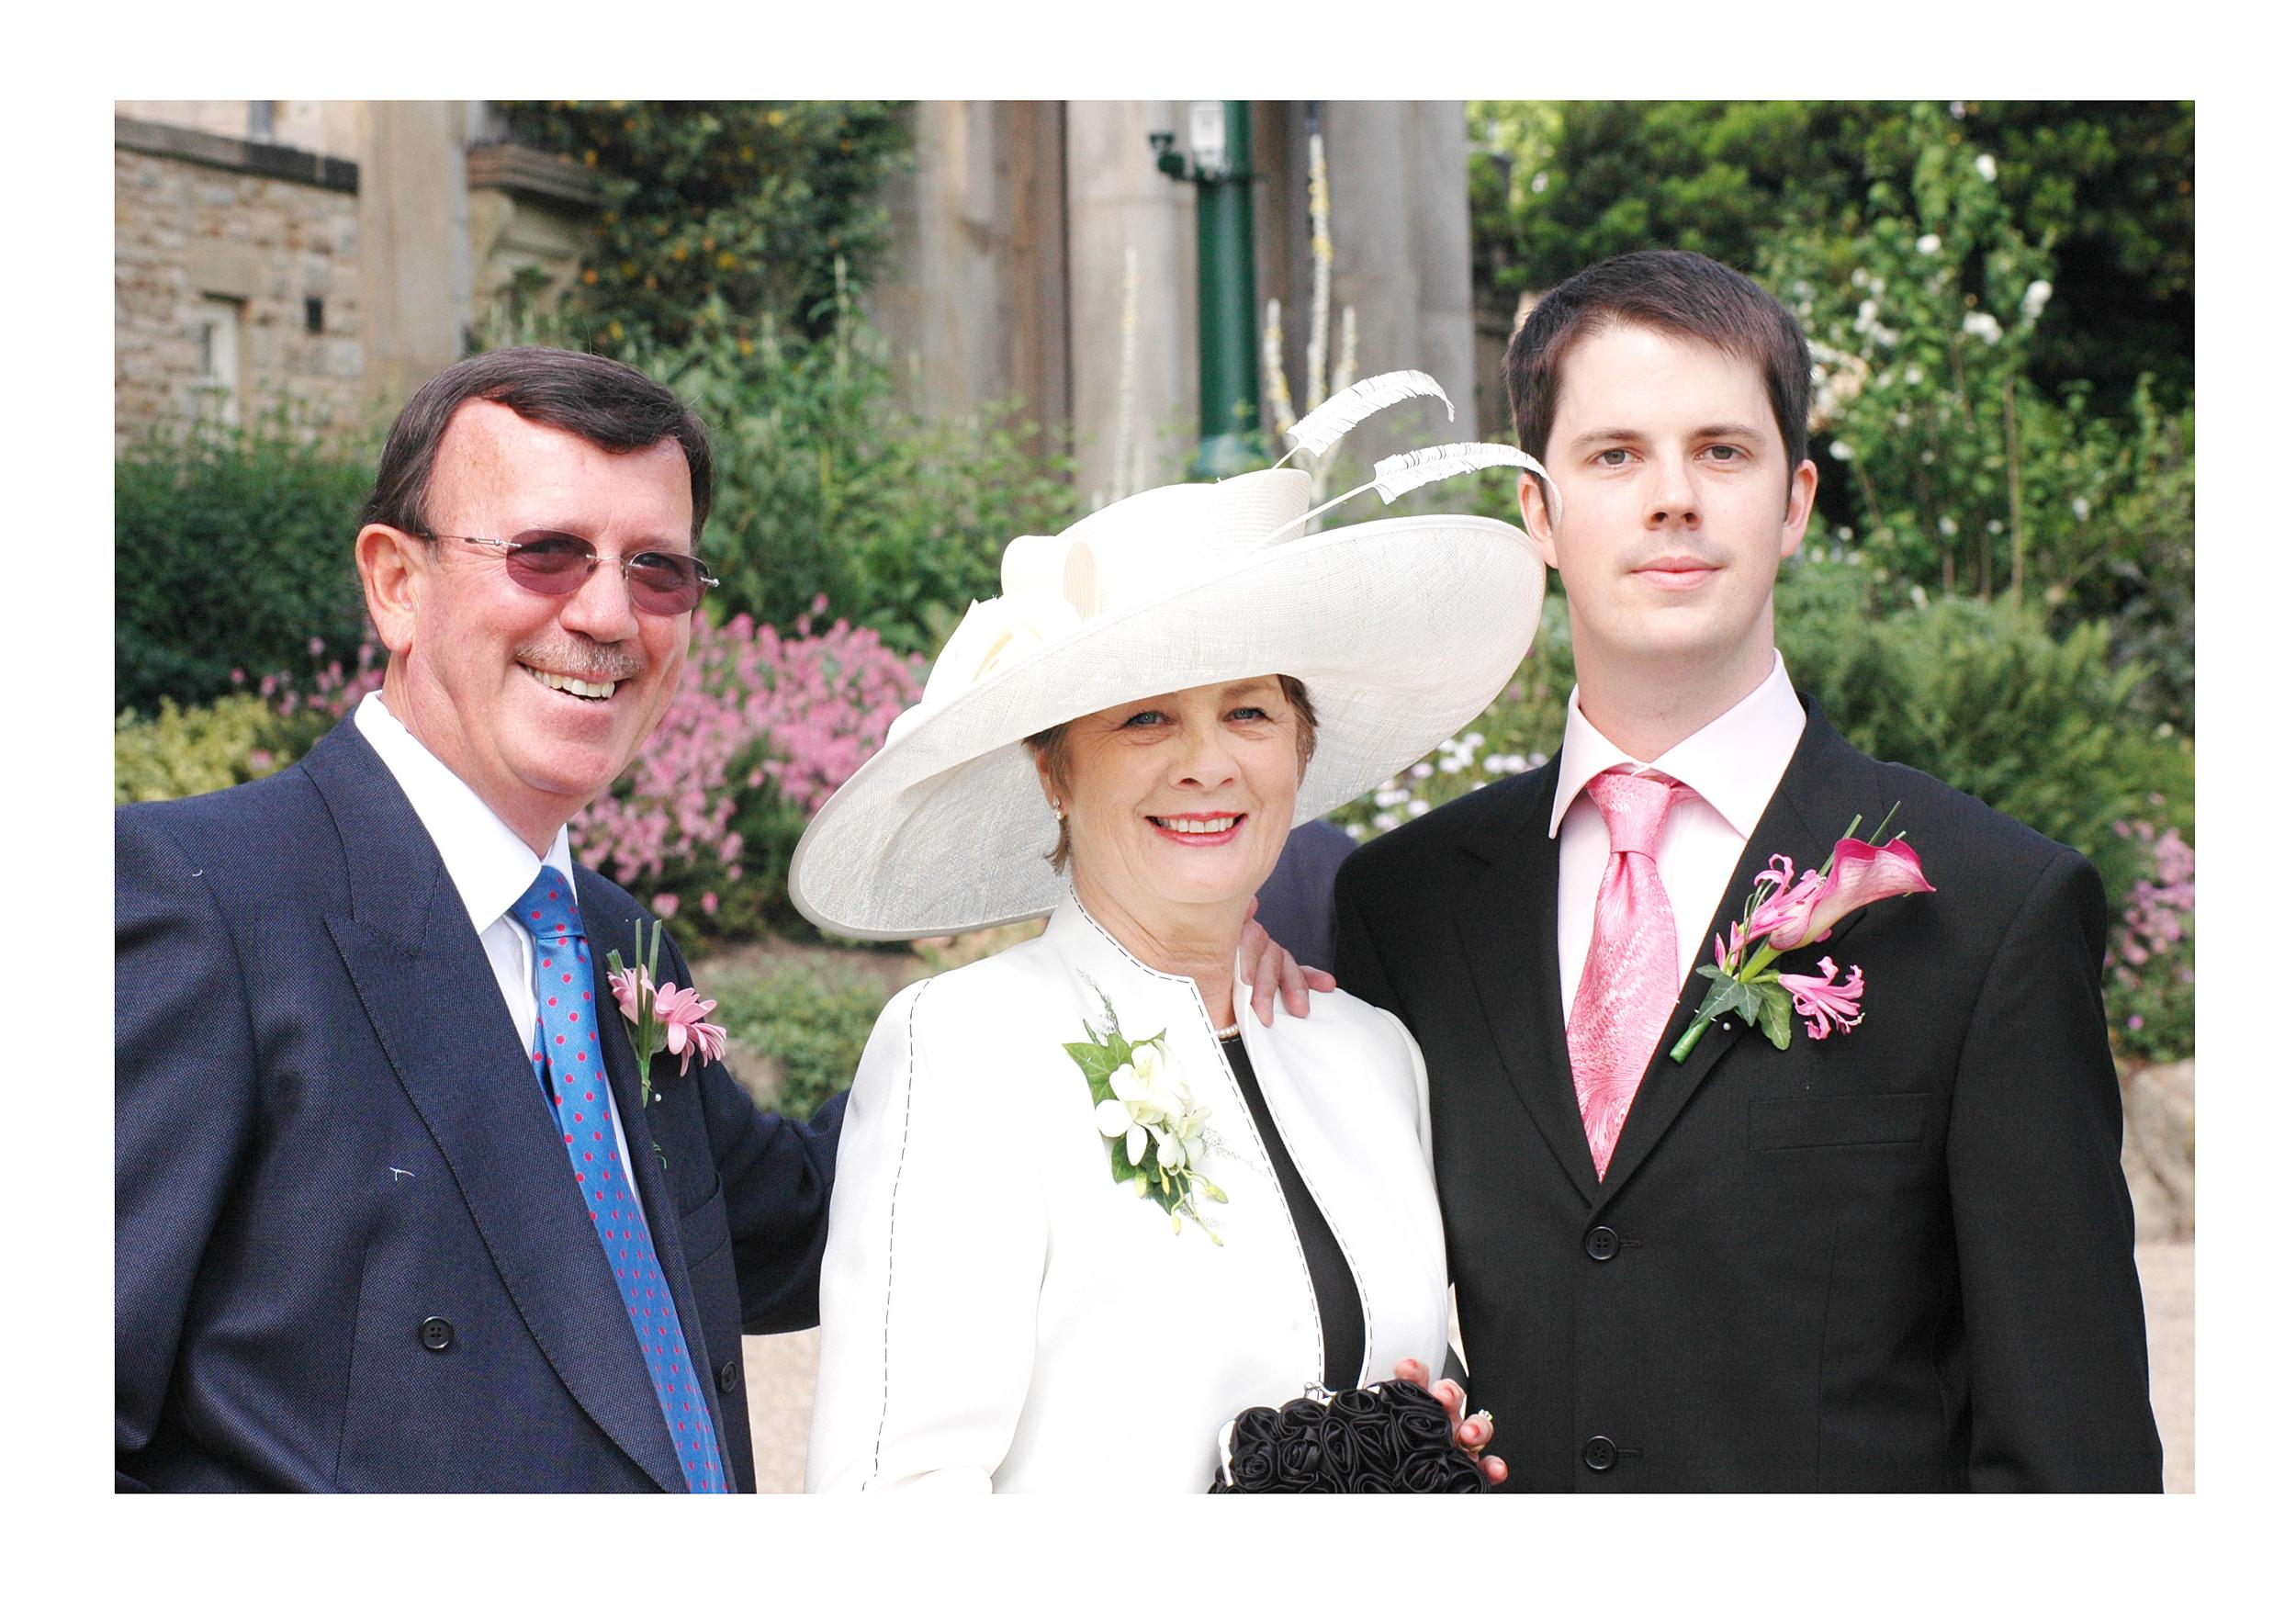 REPORTAGE-WEDDING-PHOTOGRAPHY-SET-UK-1.jpg